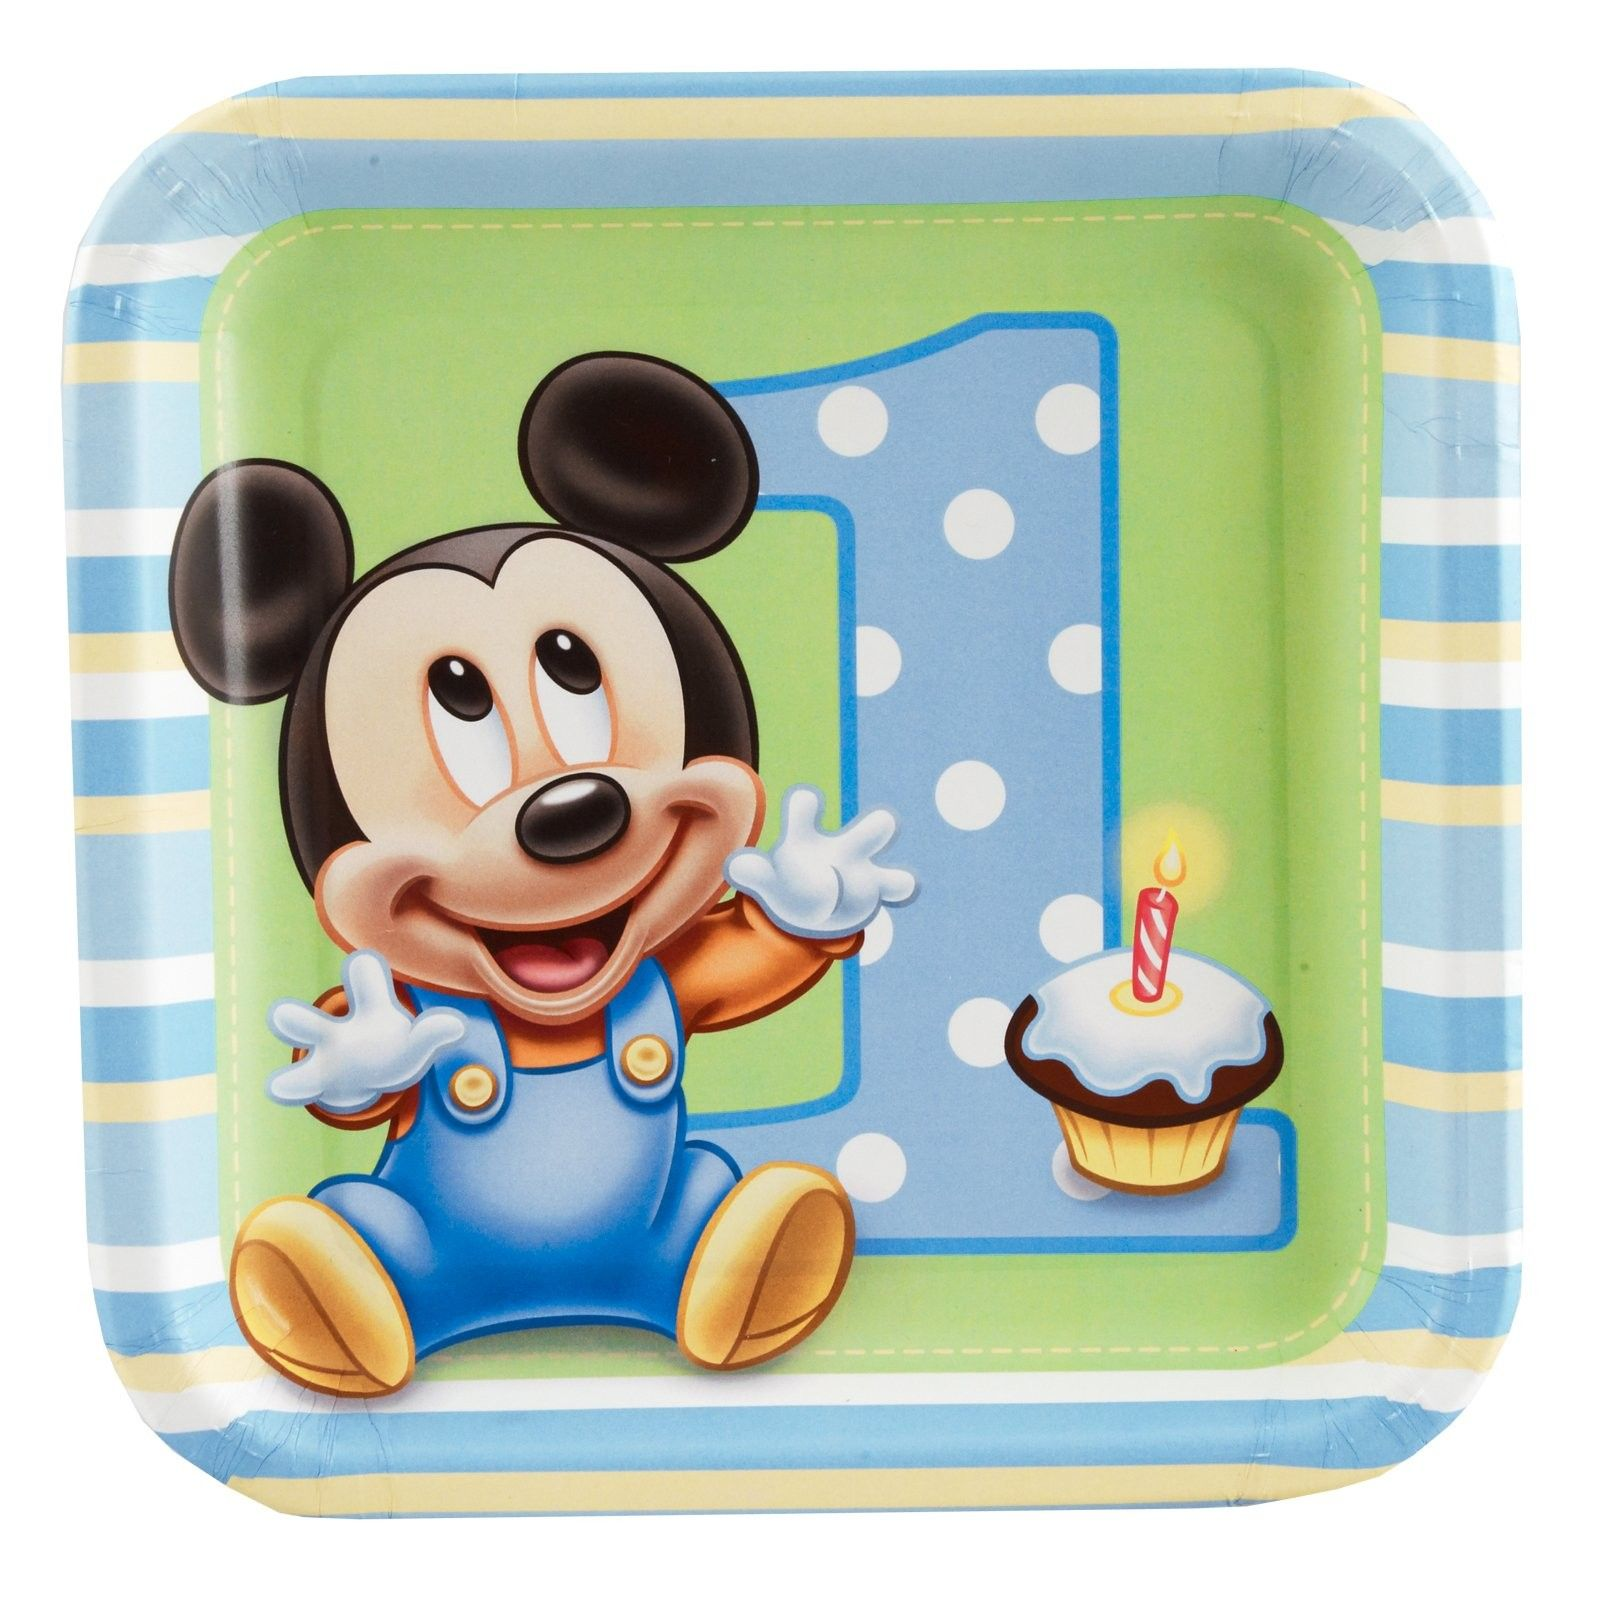 Mickey's 1st Birthday Square Dessert Plates (8 count) - Includes (8) 7 square dessert plates. This is an officially licensed © Disney product.